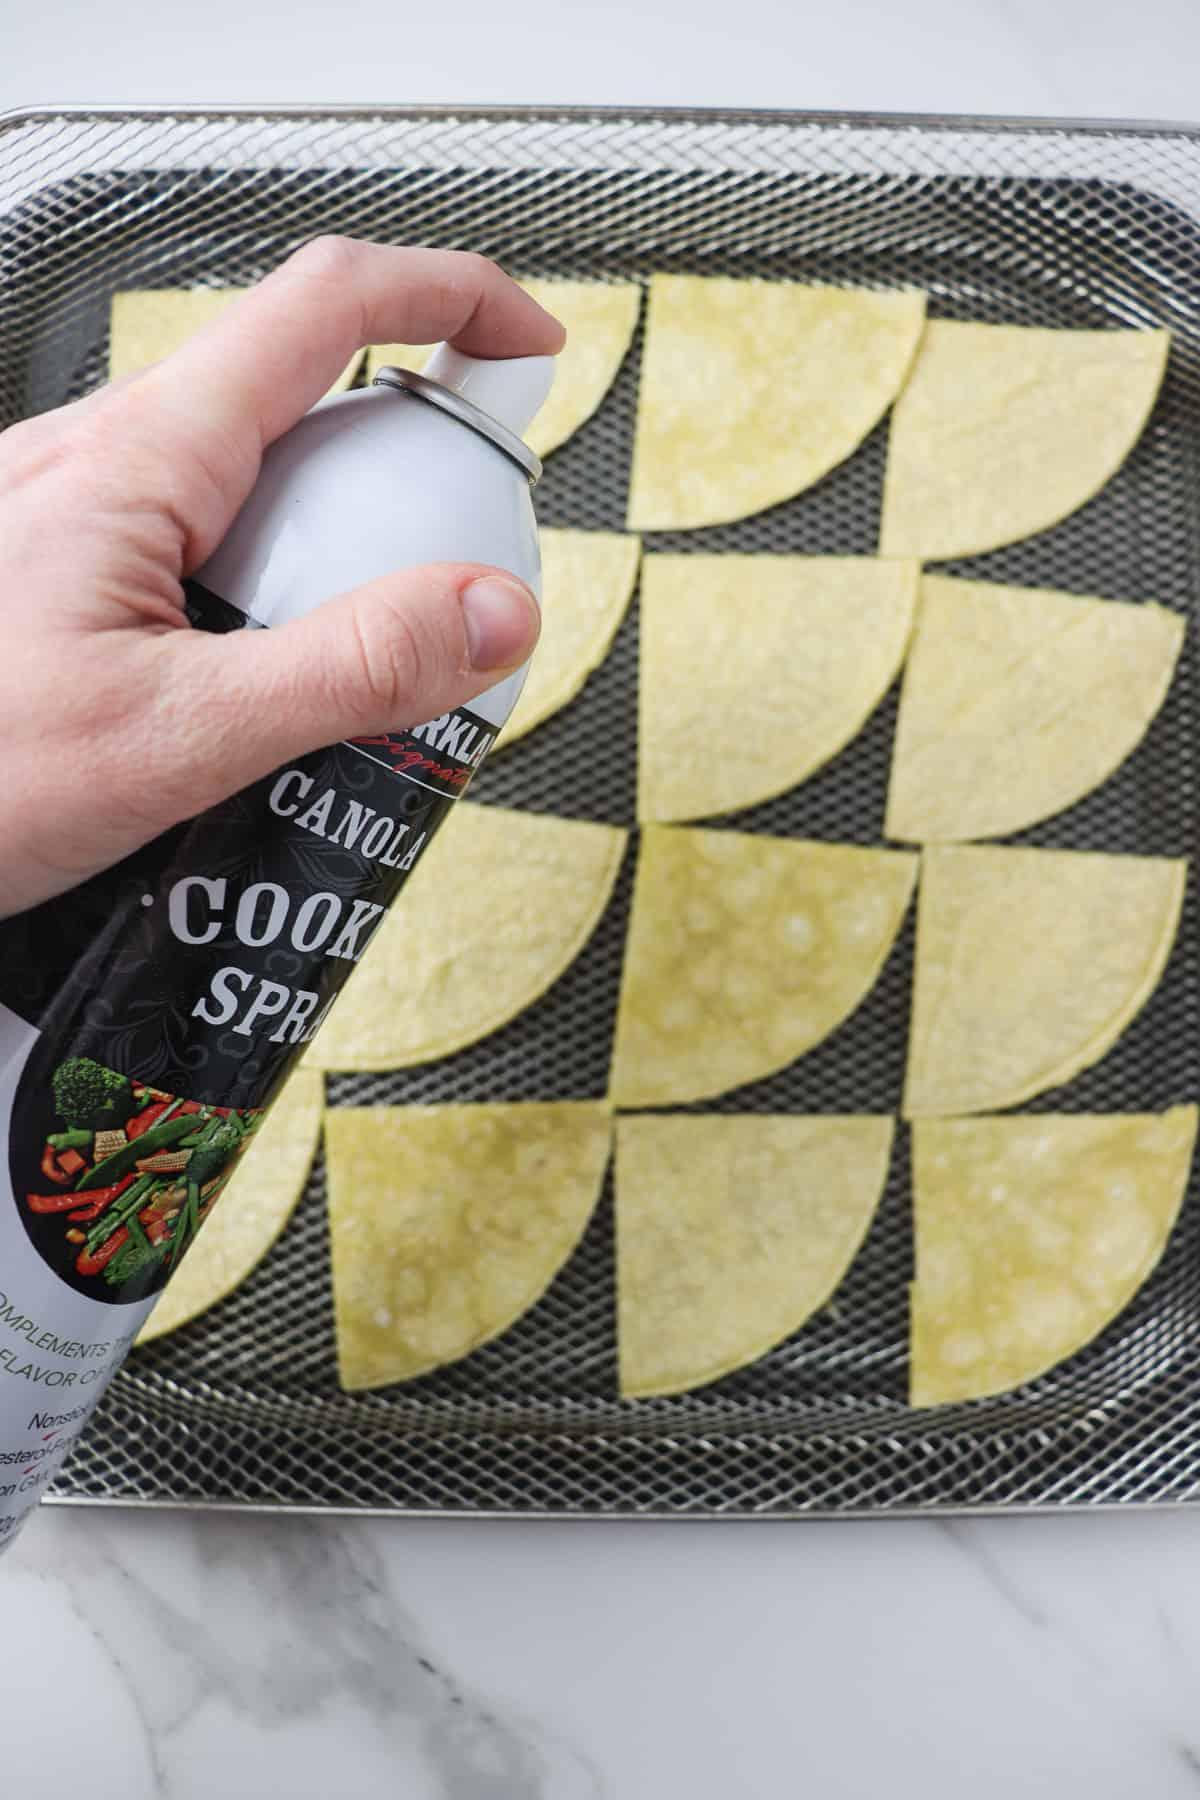 spraying corn tortillas with canola oil in air fryer basket